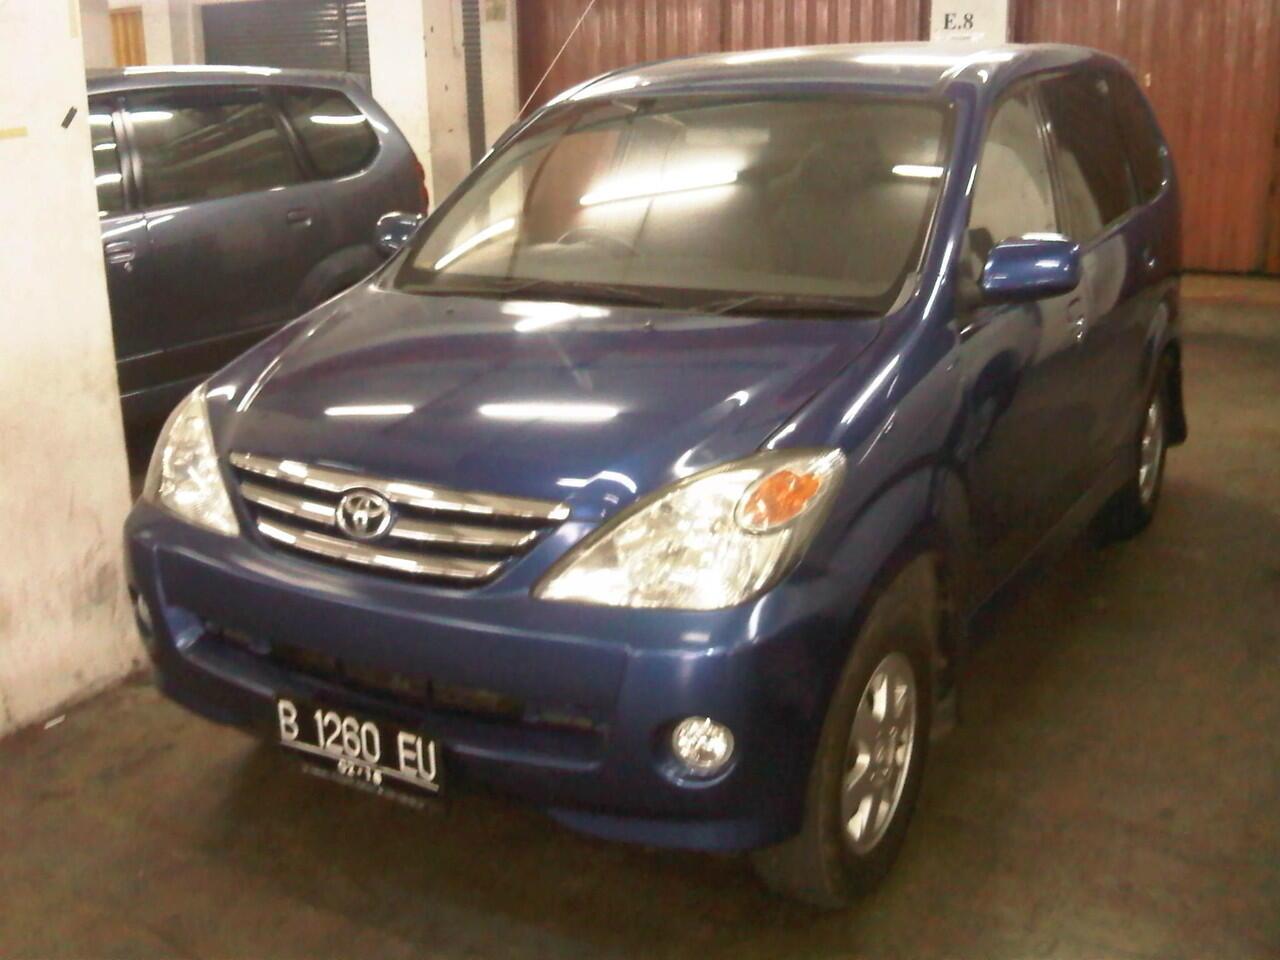 Toyota Avanza 1.3 G M/T Thn 2006 Biru